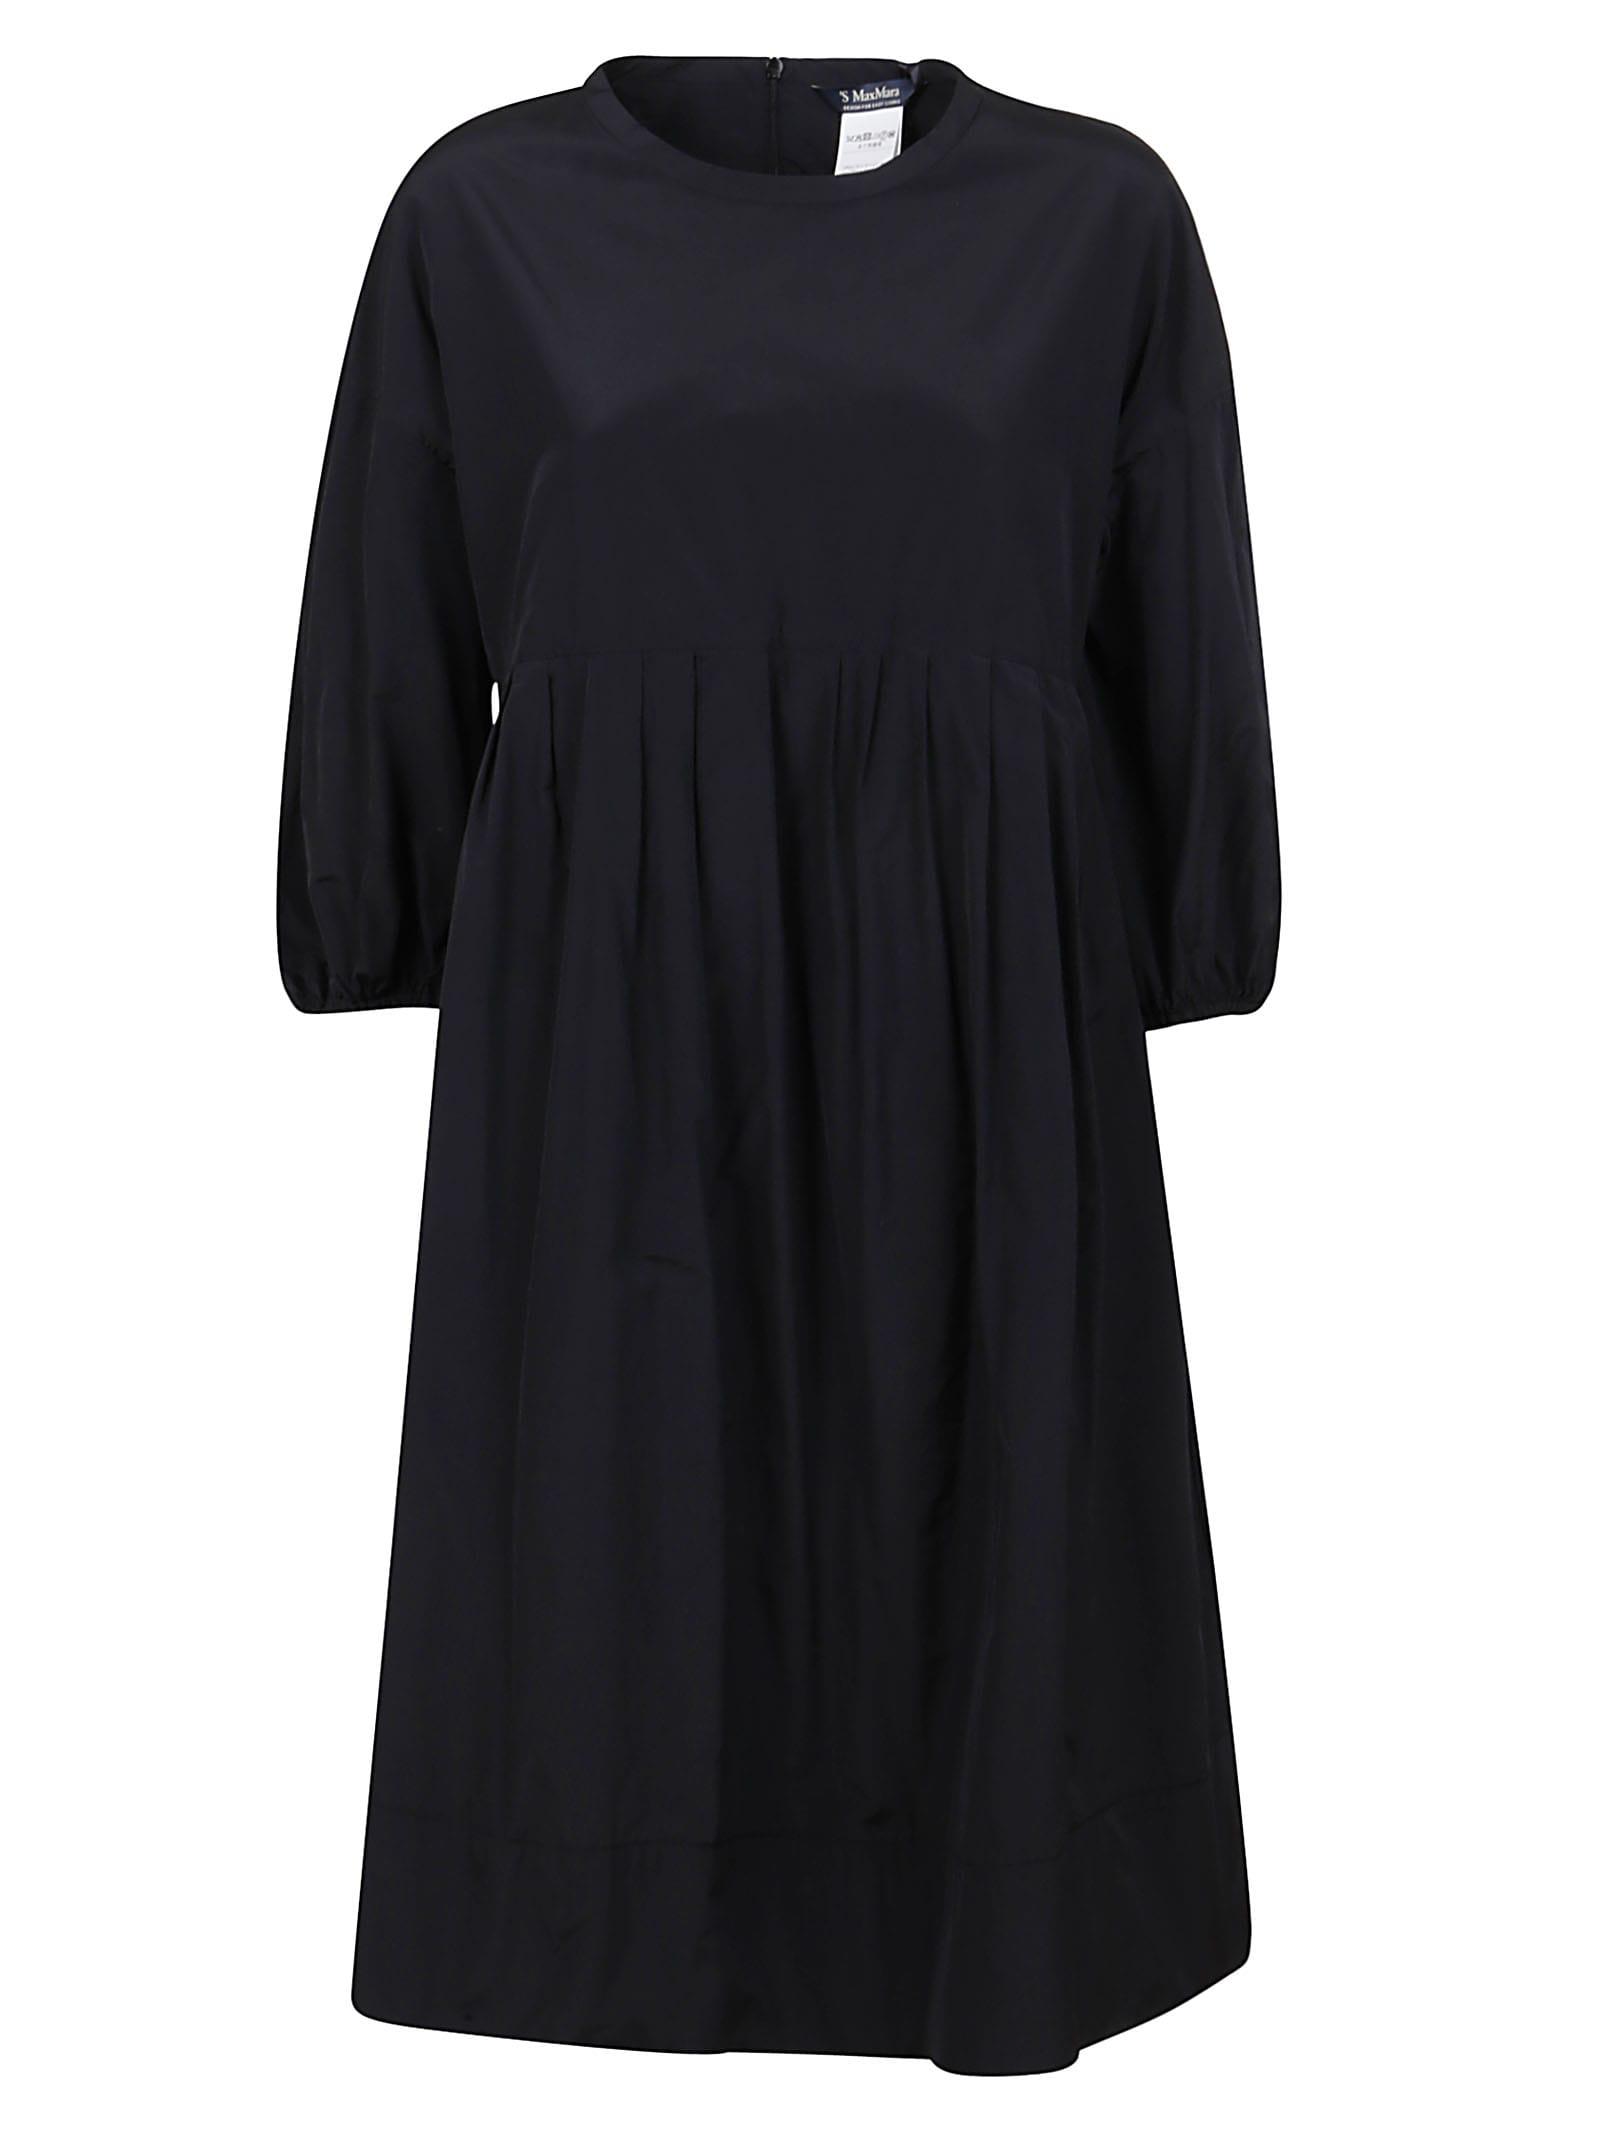 Buy S Max Mara Black Technical Fabric Dress online, shop S Max Mara with free shipping